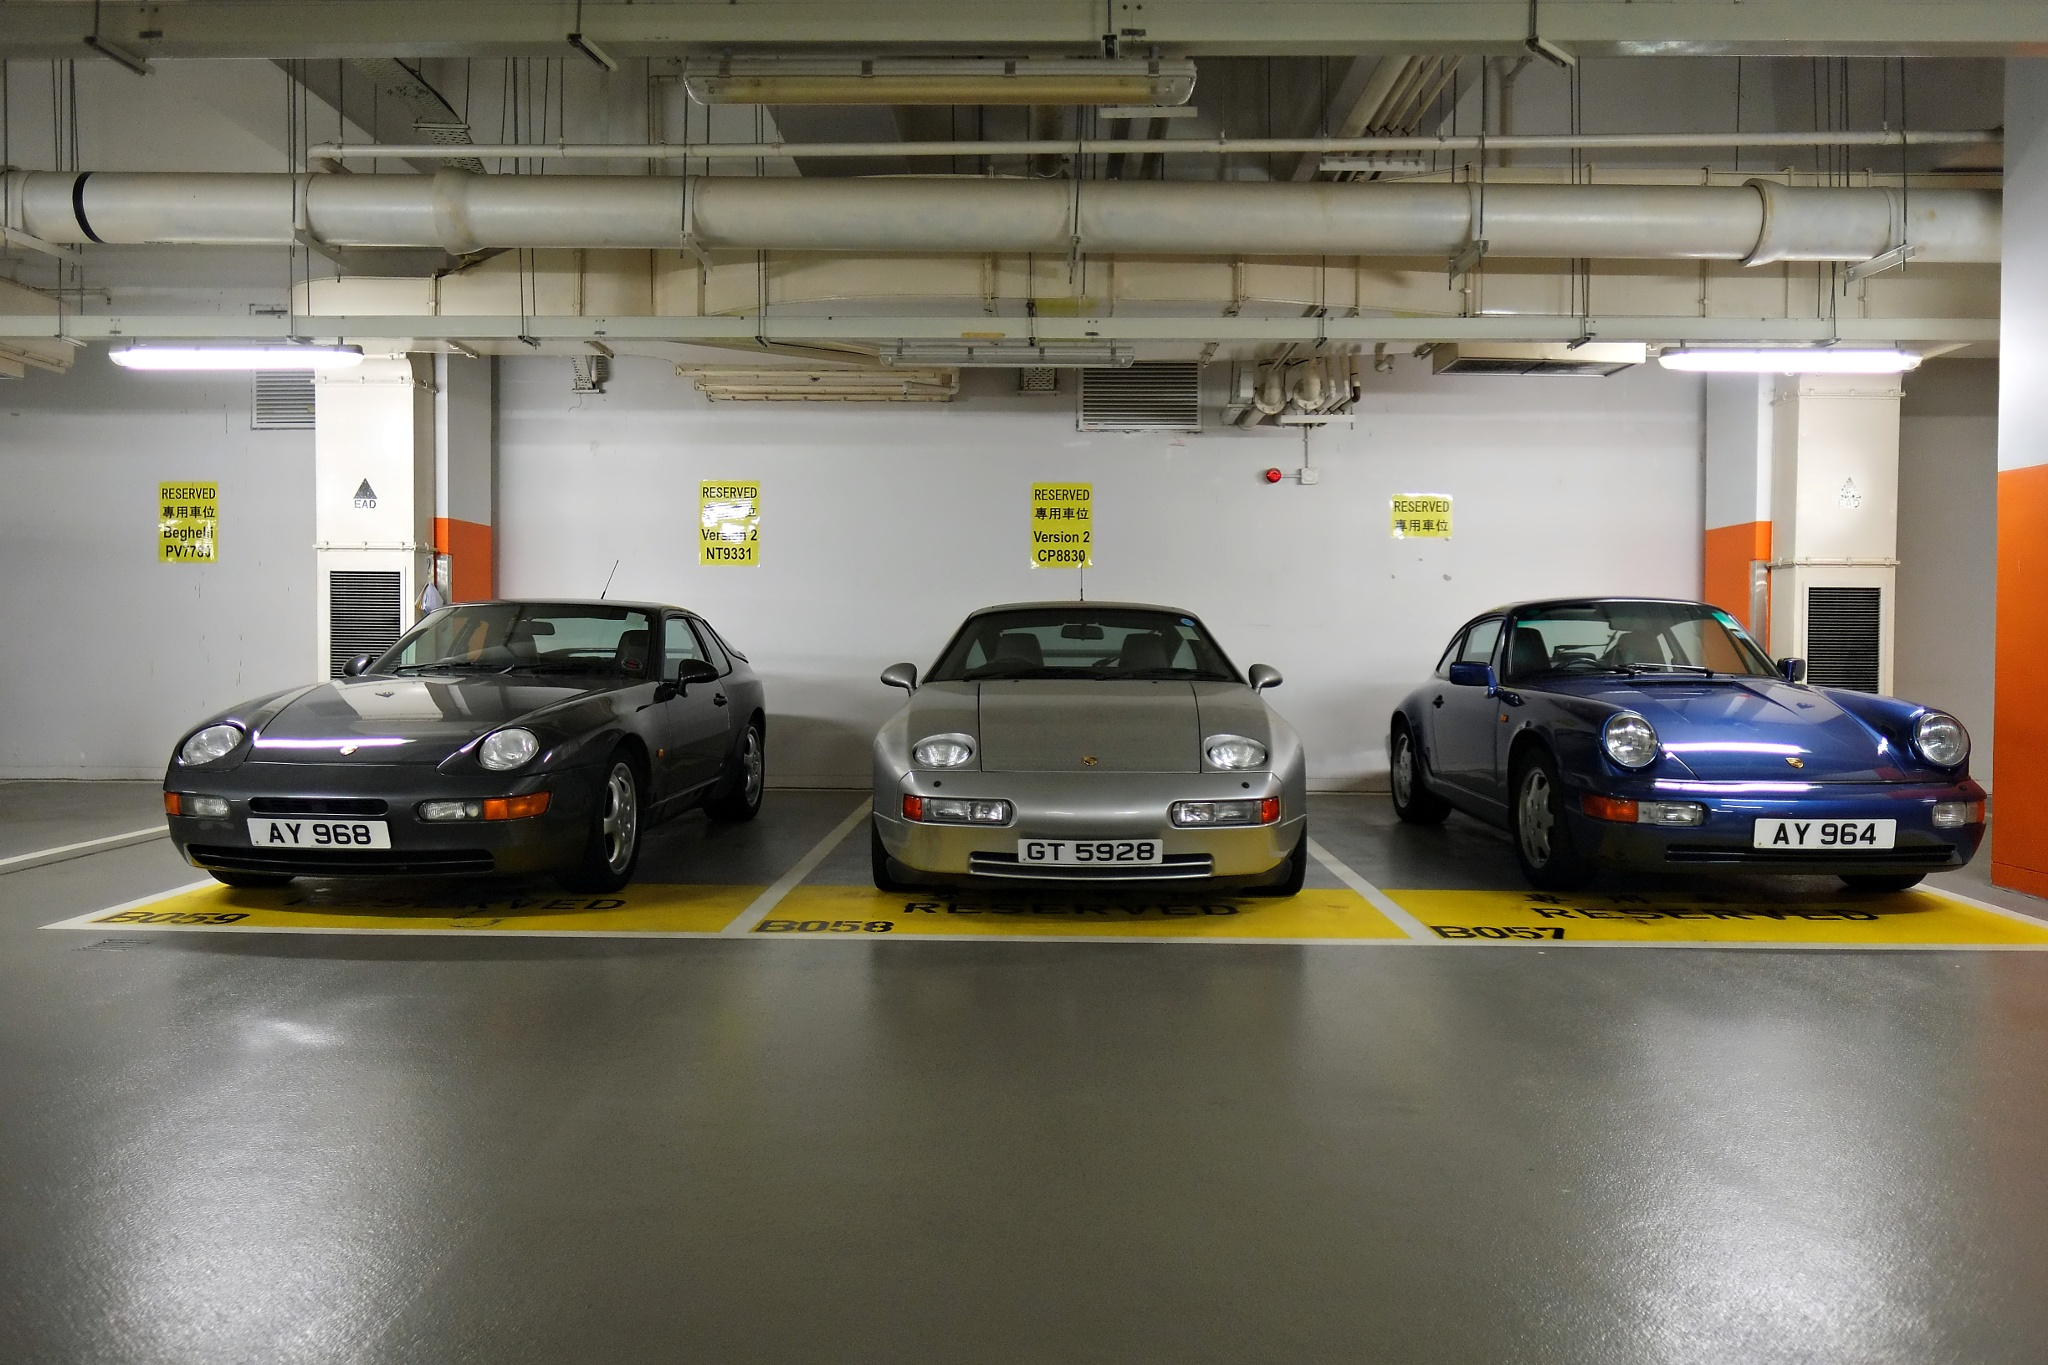 Porsche by David Lam